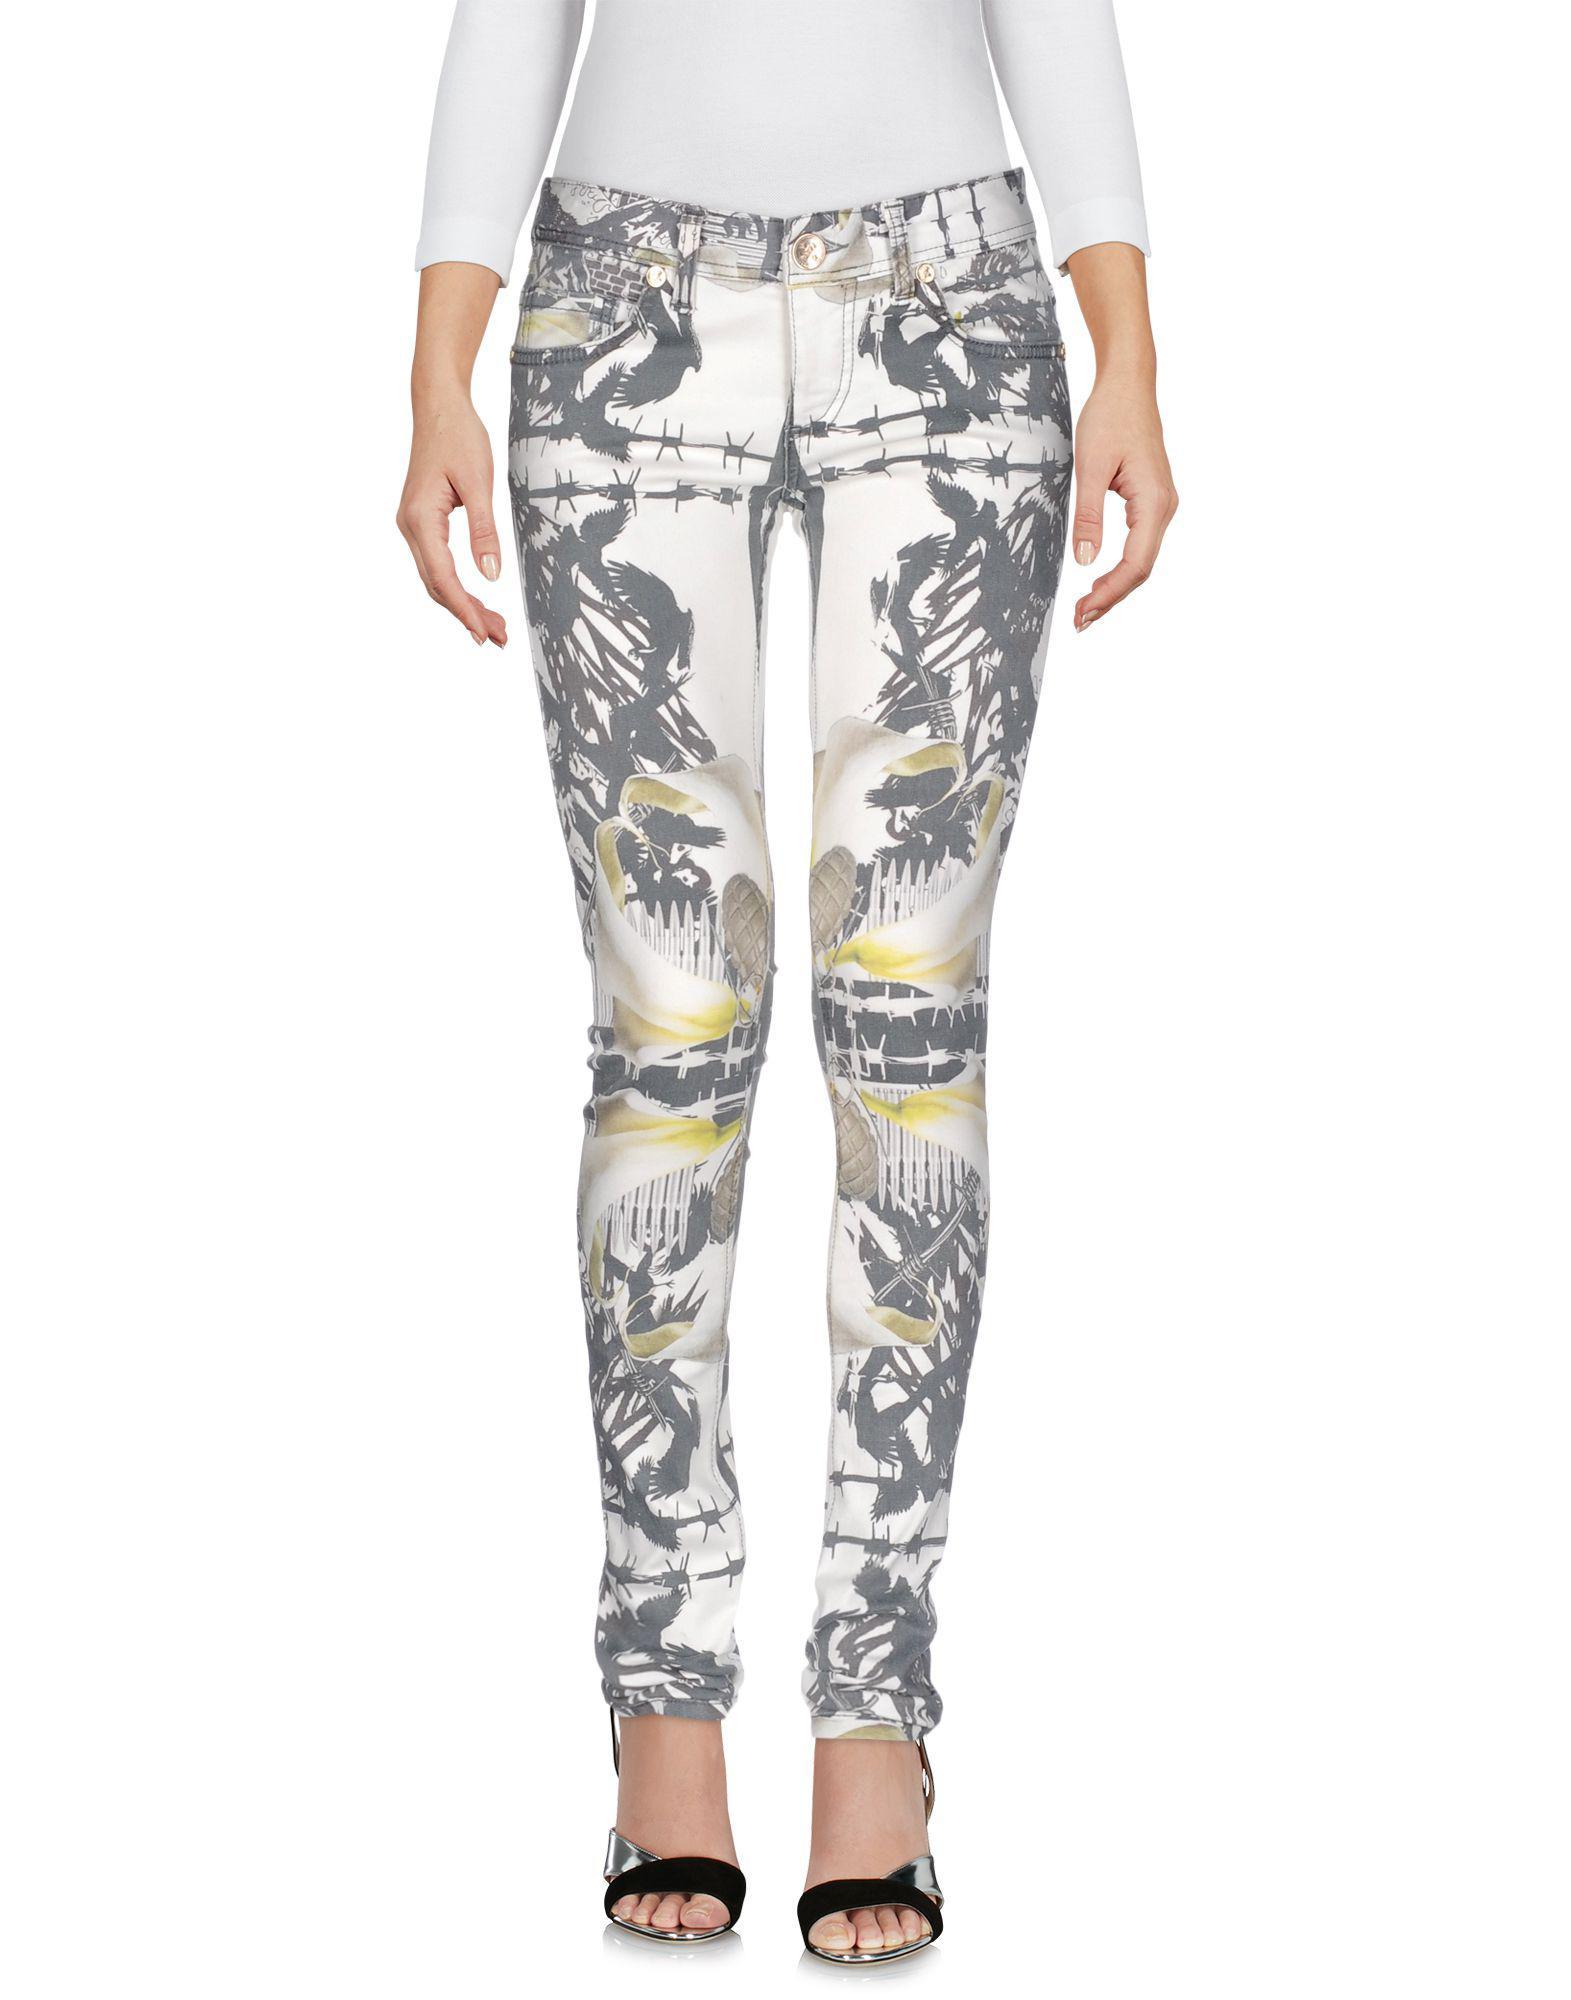 DENIM - Denim trousers Les Éclaires Original Buy Cheap Browse Sale Supply Free Shipping Best Prices Best Sale Cheap Online wn8Fg1Jqd